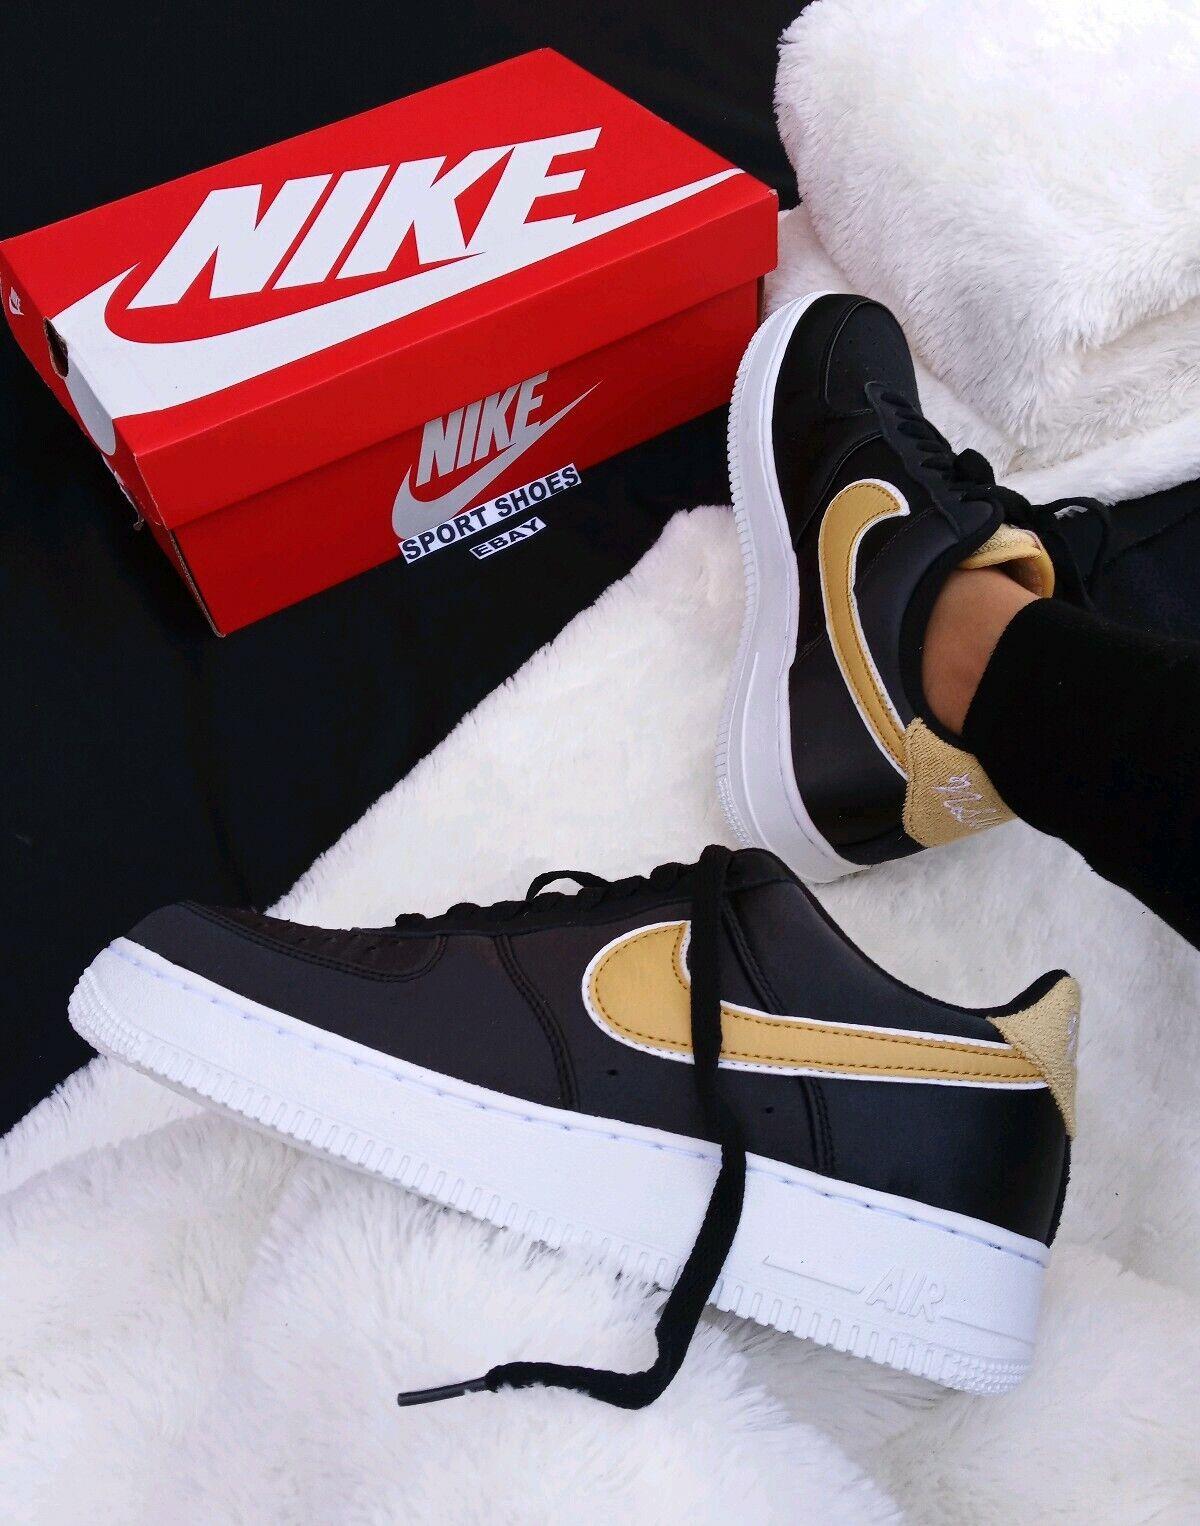 10.5 WOMEN'S Nike Air Force 1 07 BLACK RIBBON AA0287 005 YELLOW CASUAL